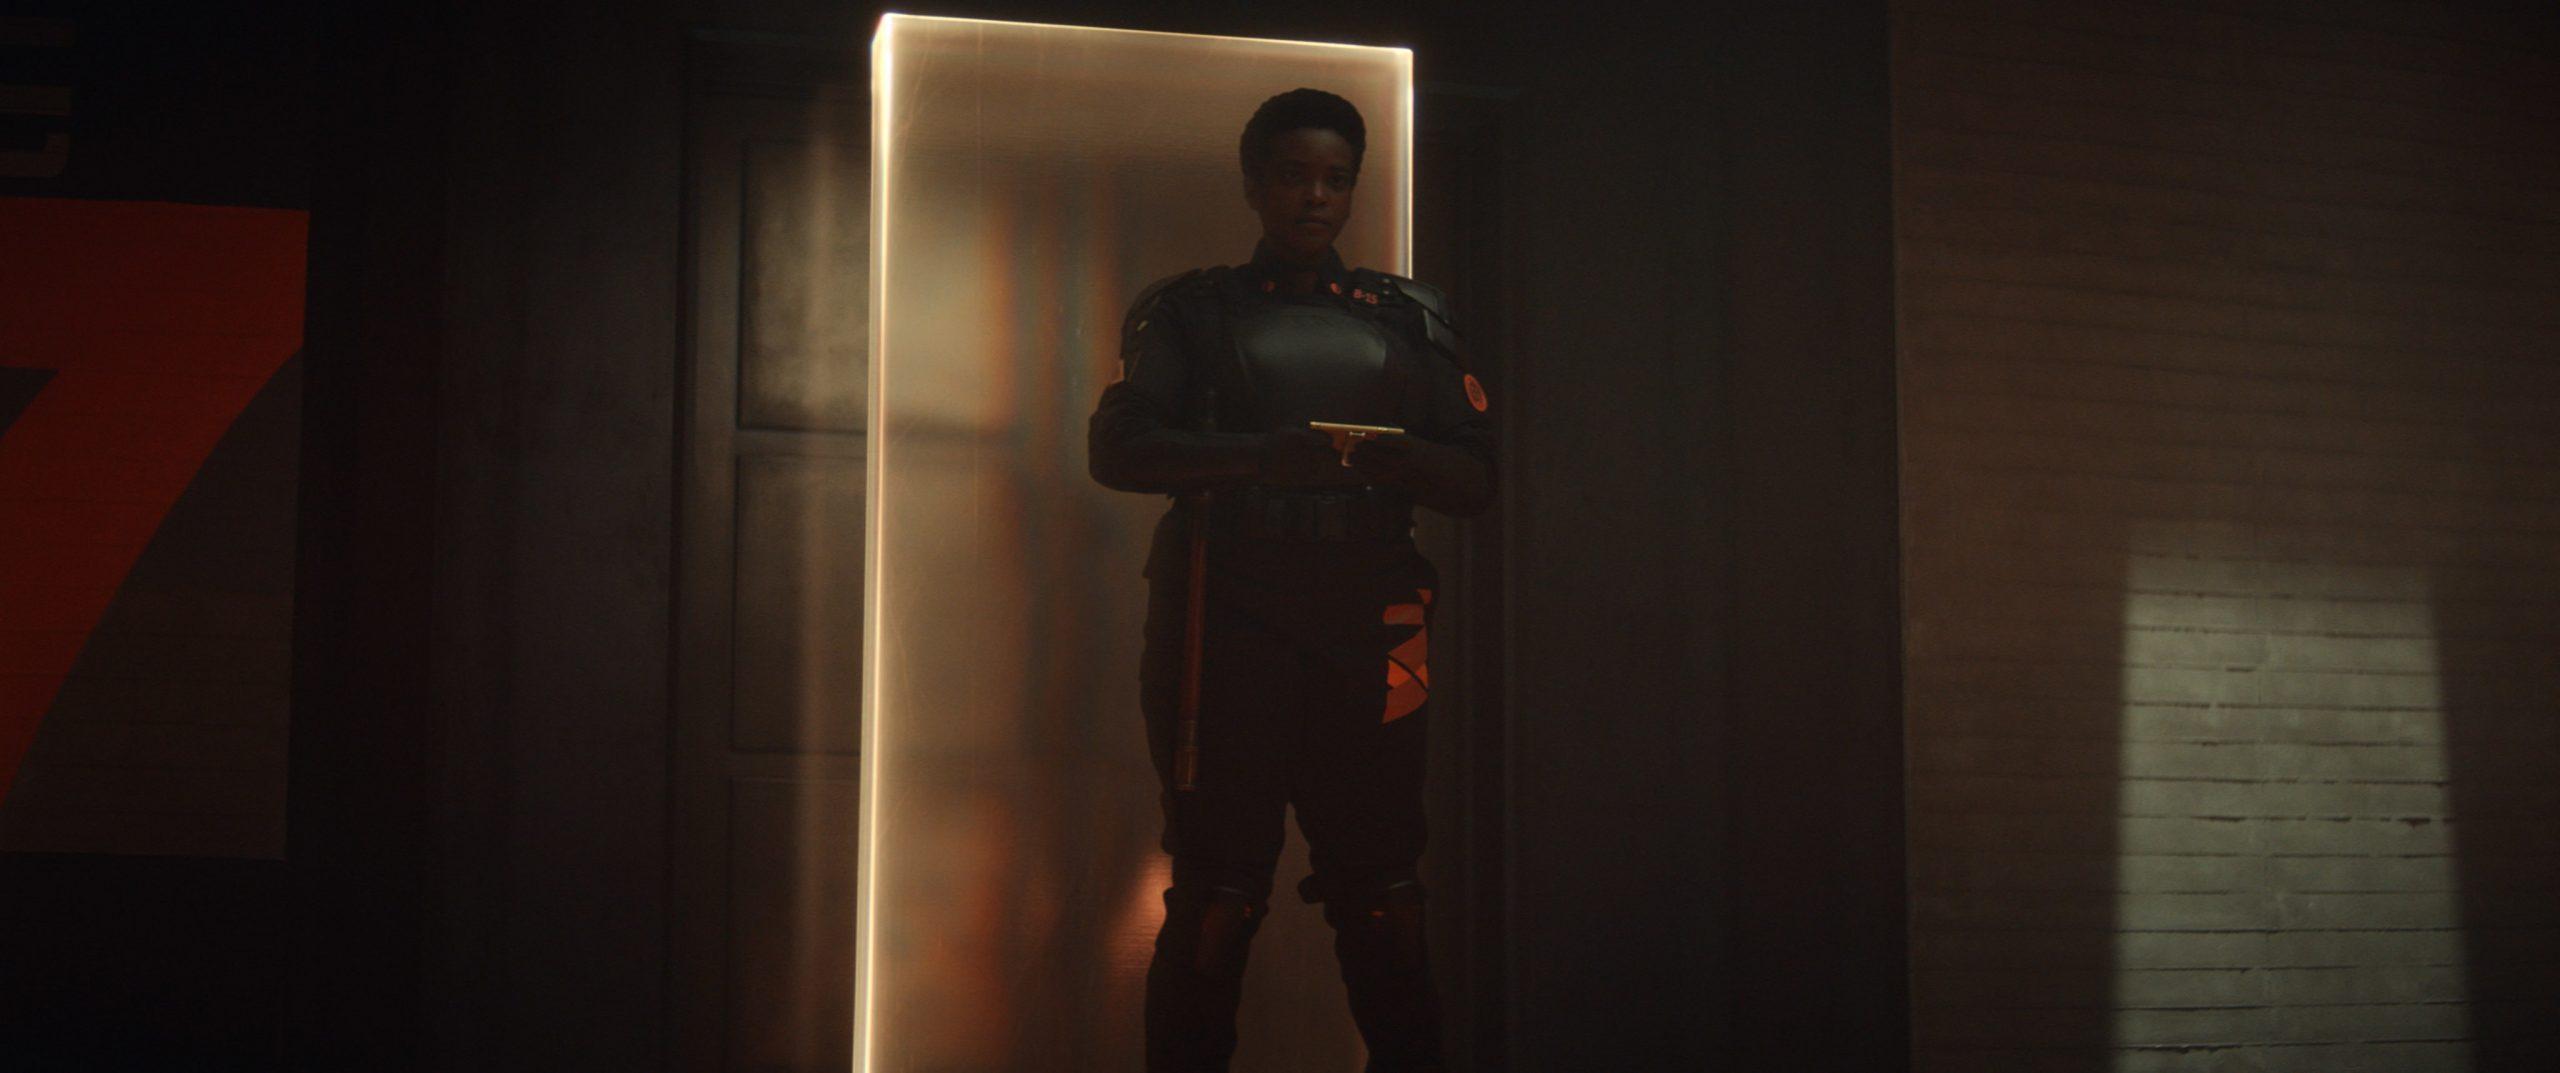 loki 1x04 recensione